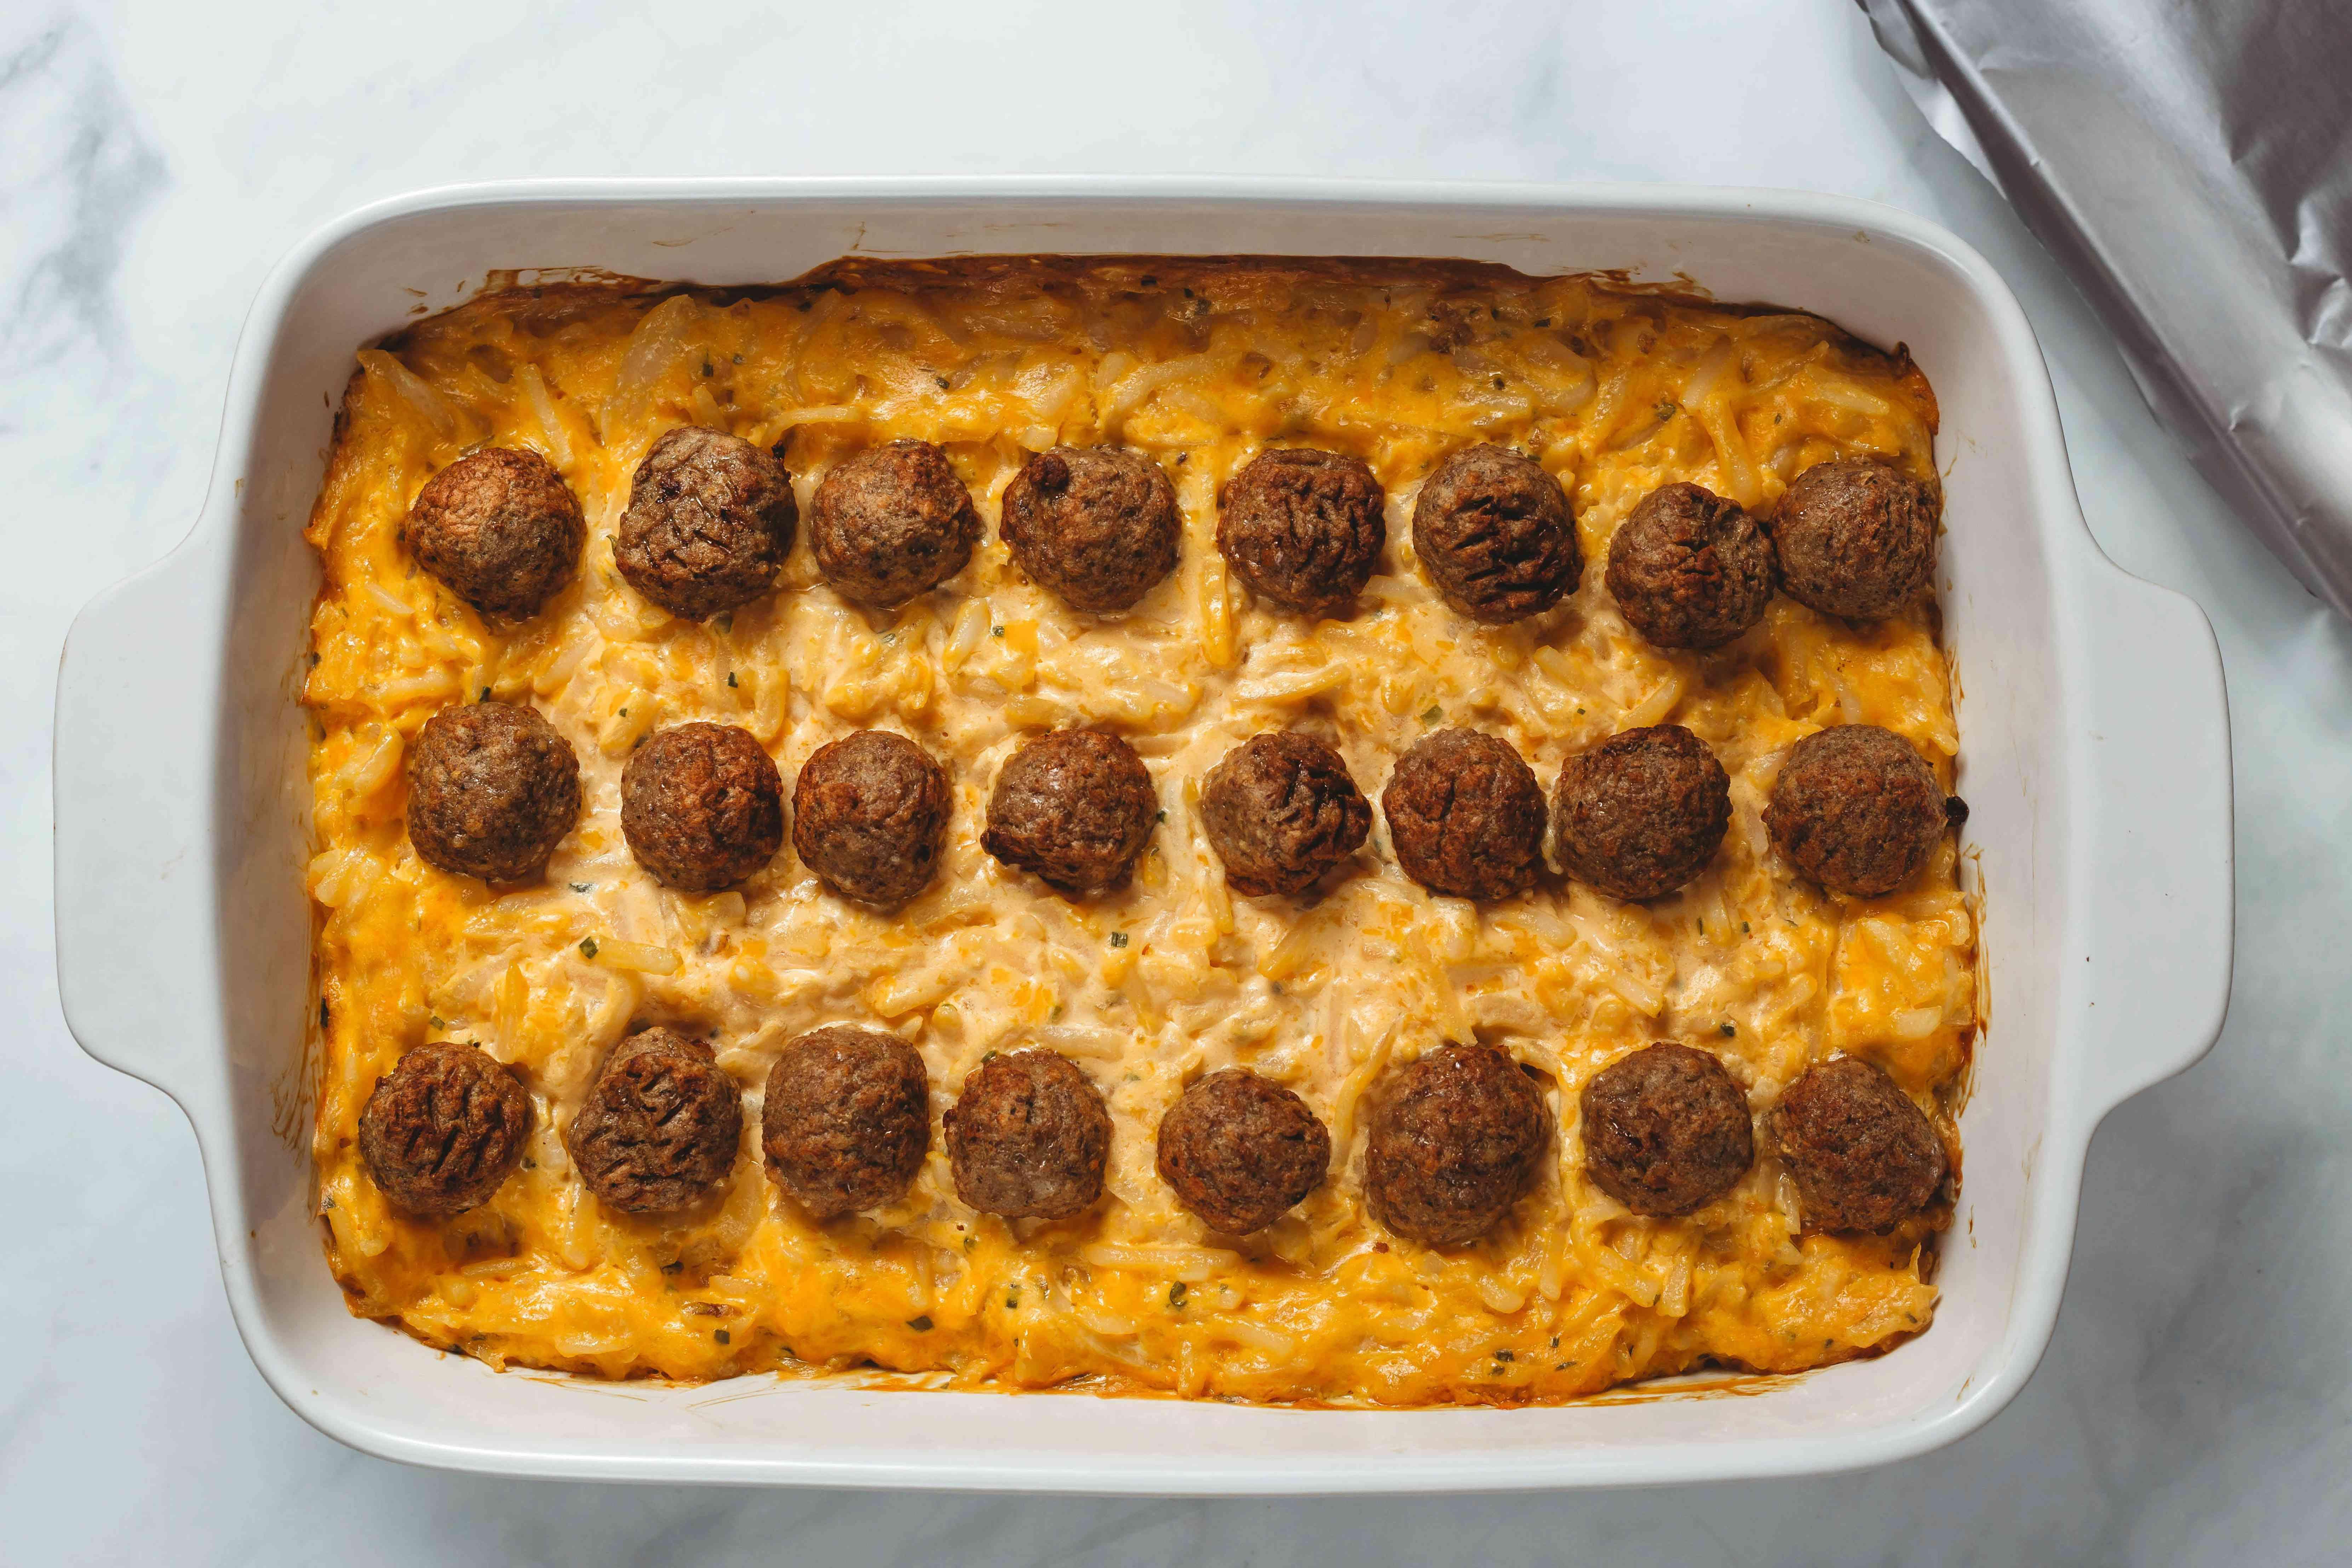 baked Meaty Hash Brown Potato Casserole